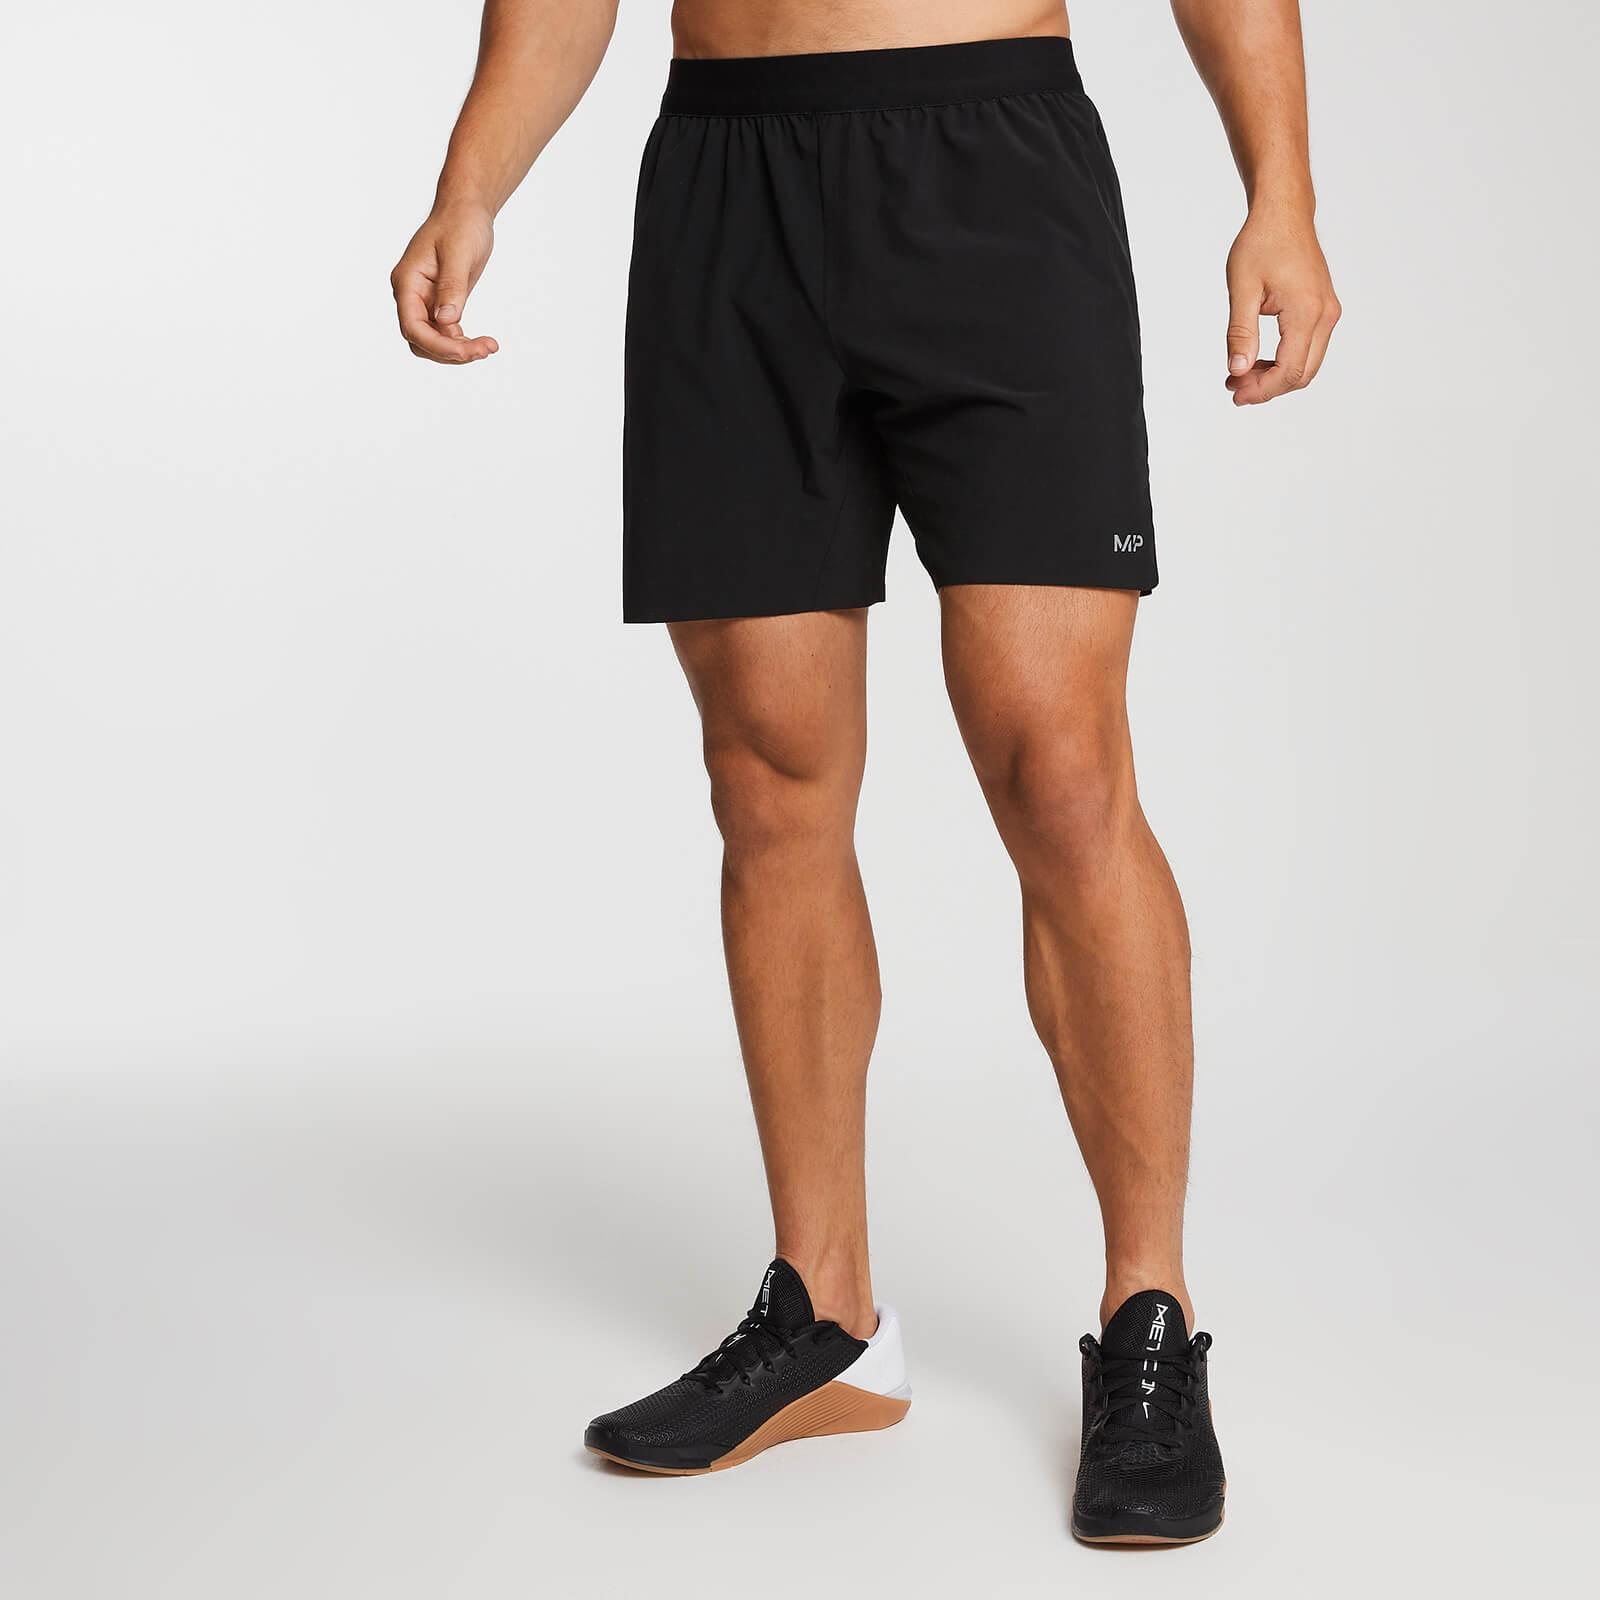 MP Essentials Training Shorts - Sort - Xxs